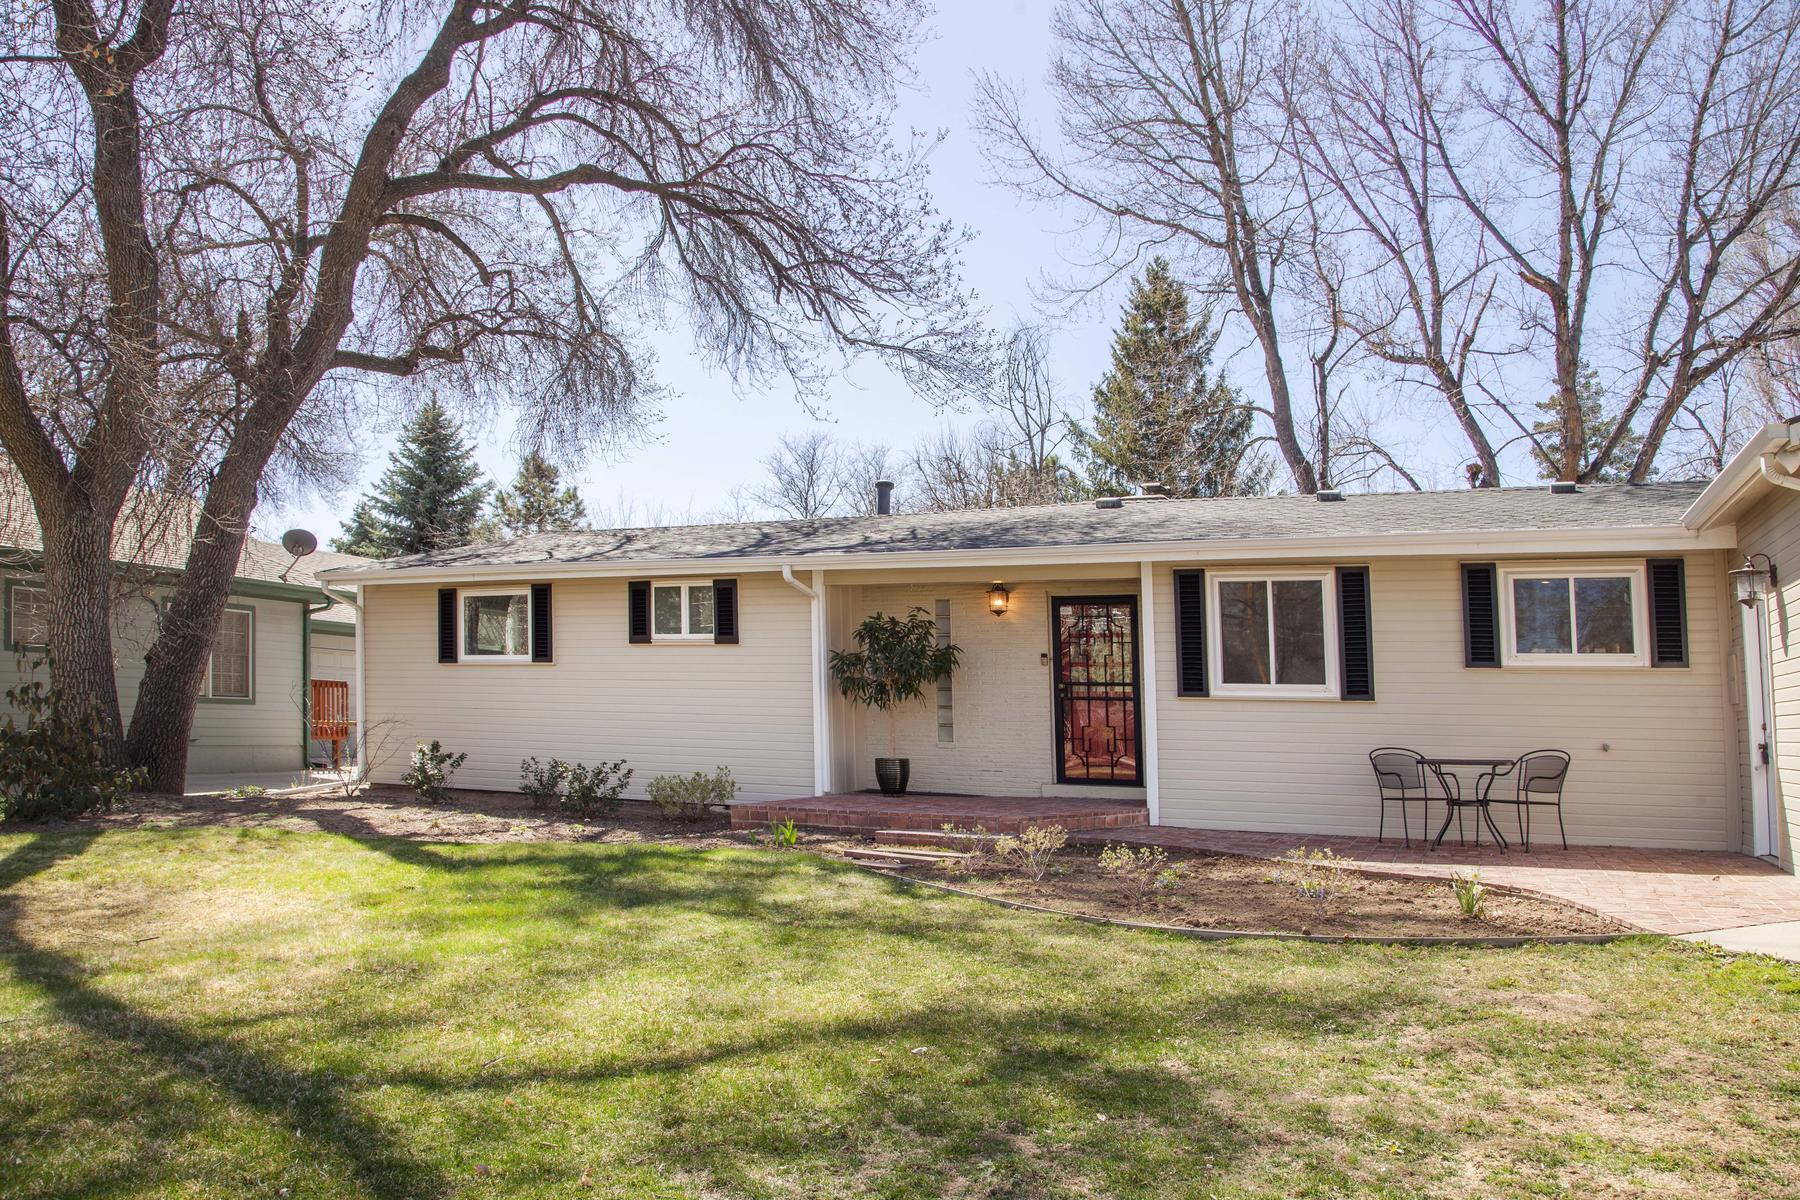 Single Family Home for Sale at 3/4 ACRE OF GORGEOUS FLAT LAND! 2331 S Jackson St, University Park, Denver, Colorado, 80210 United States